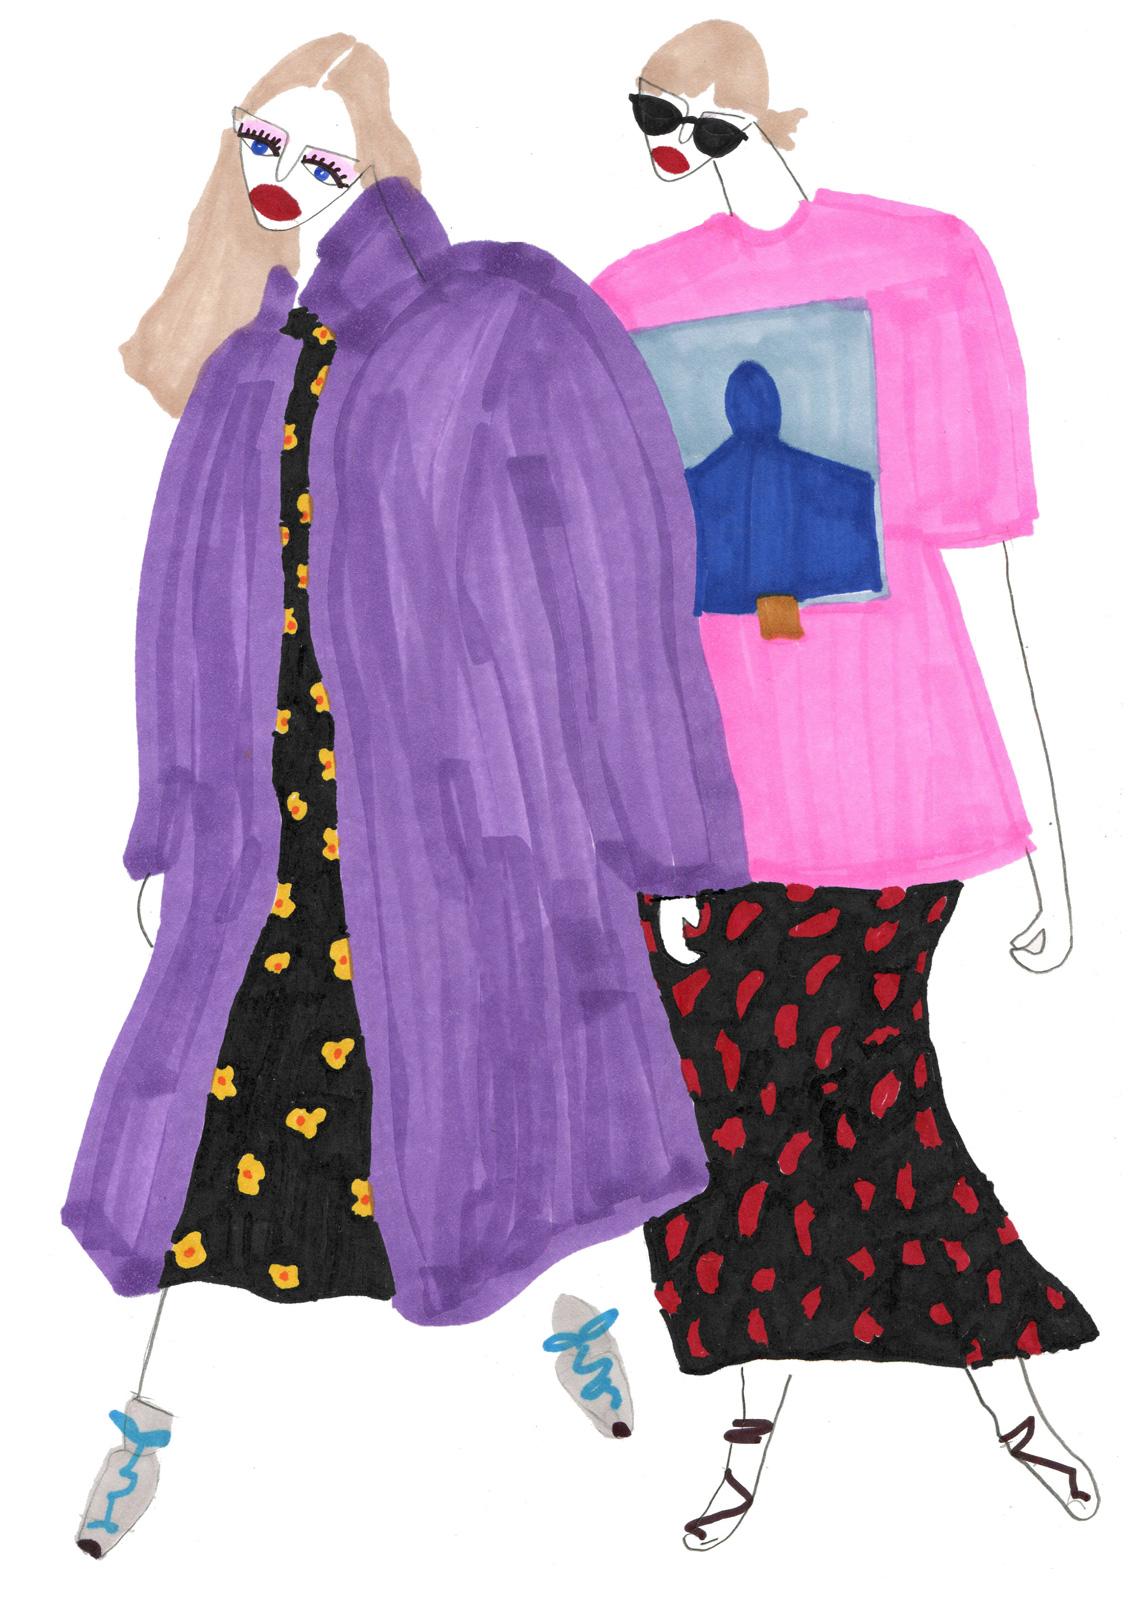 purplecoat.jpg